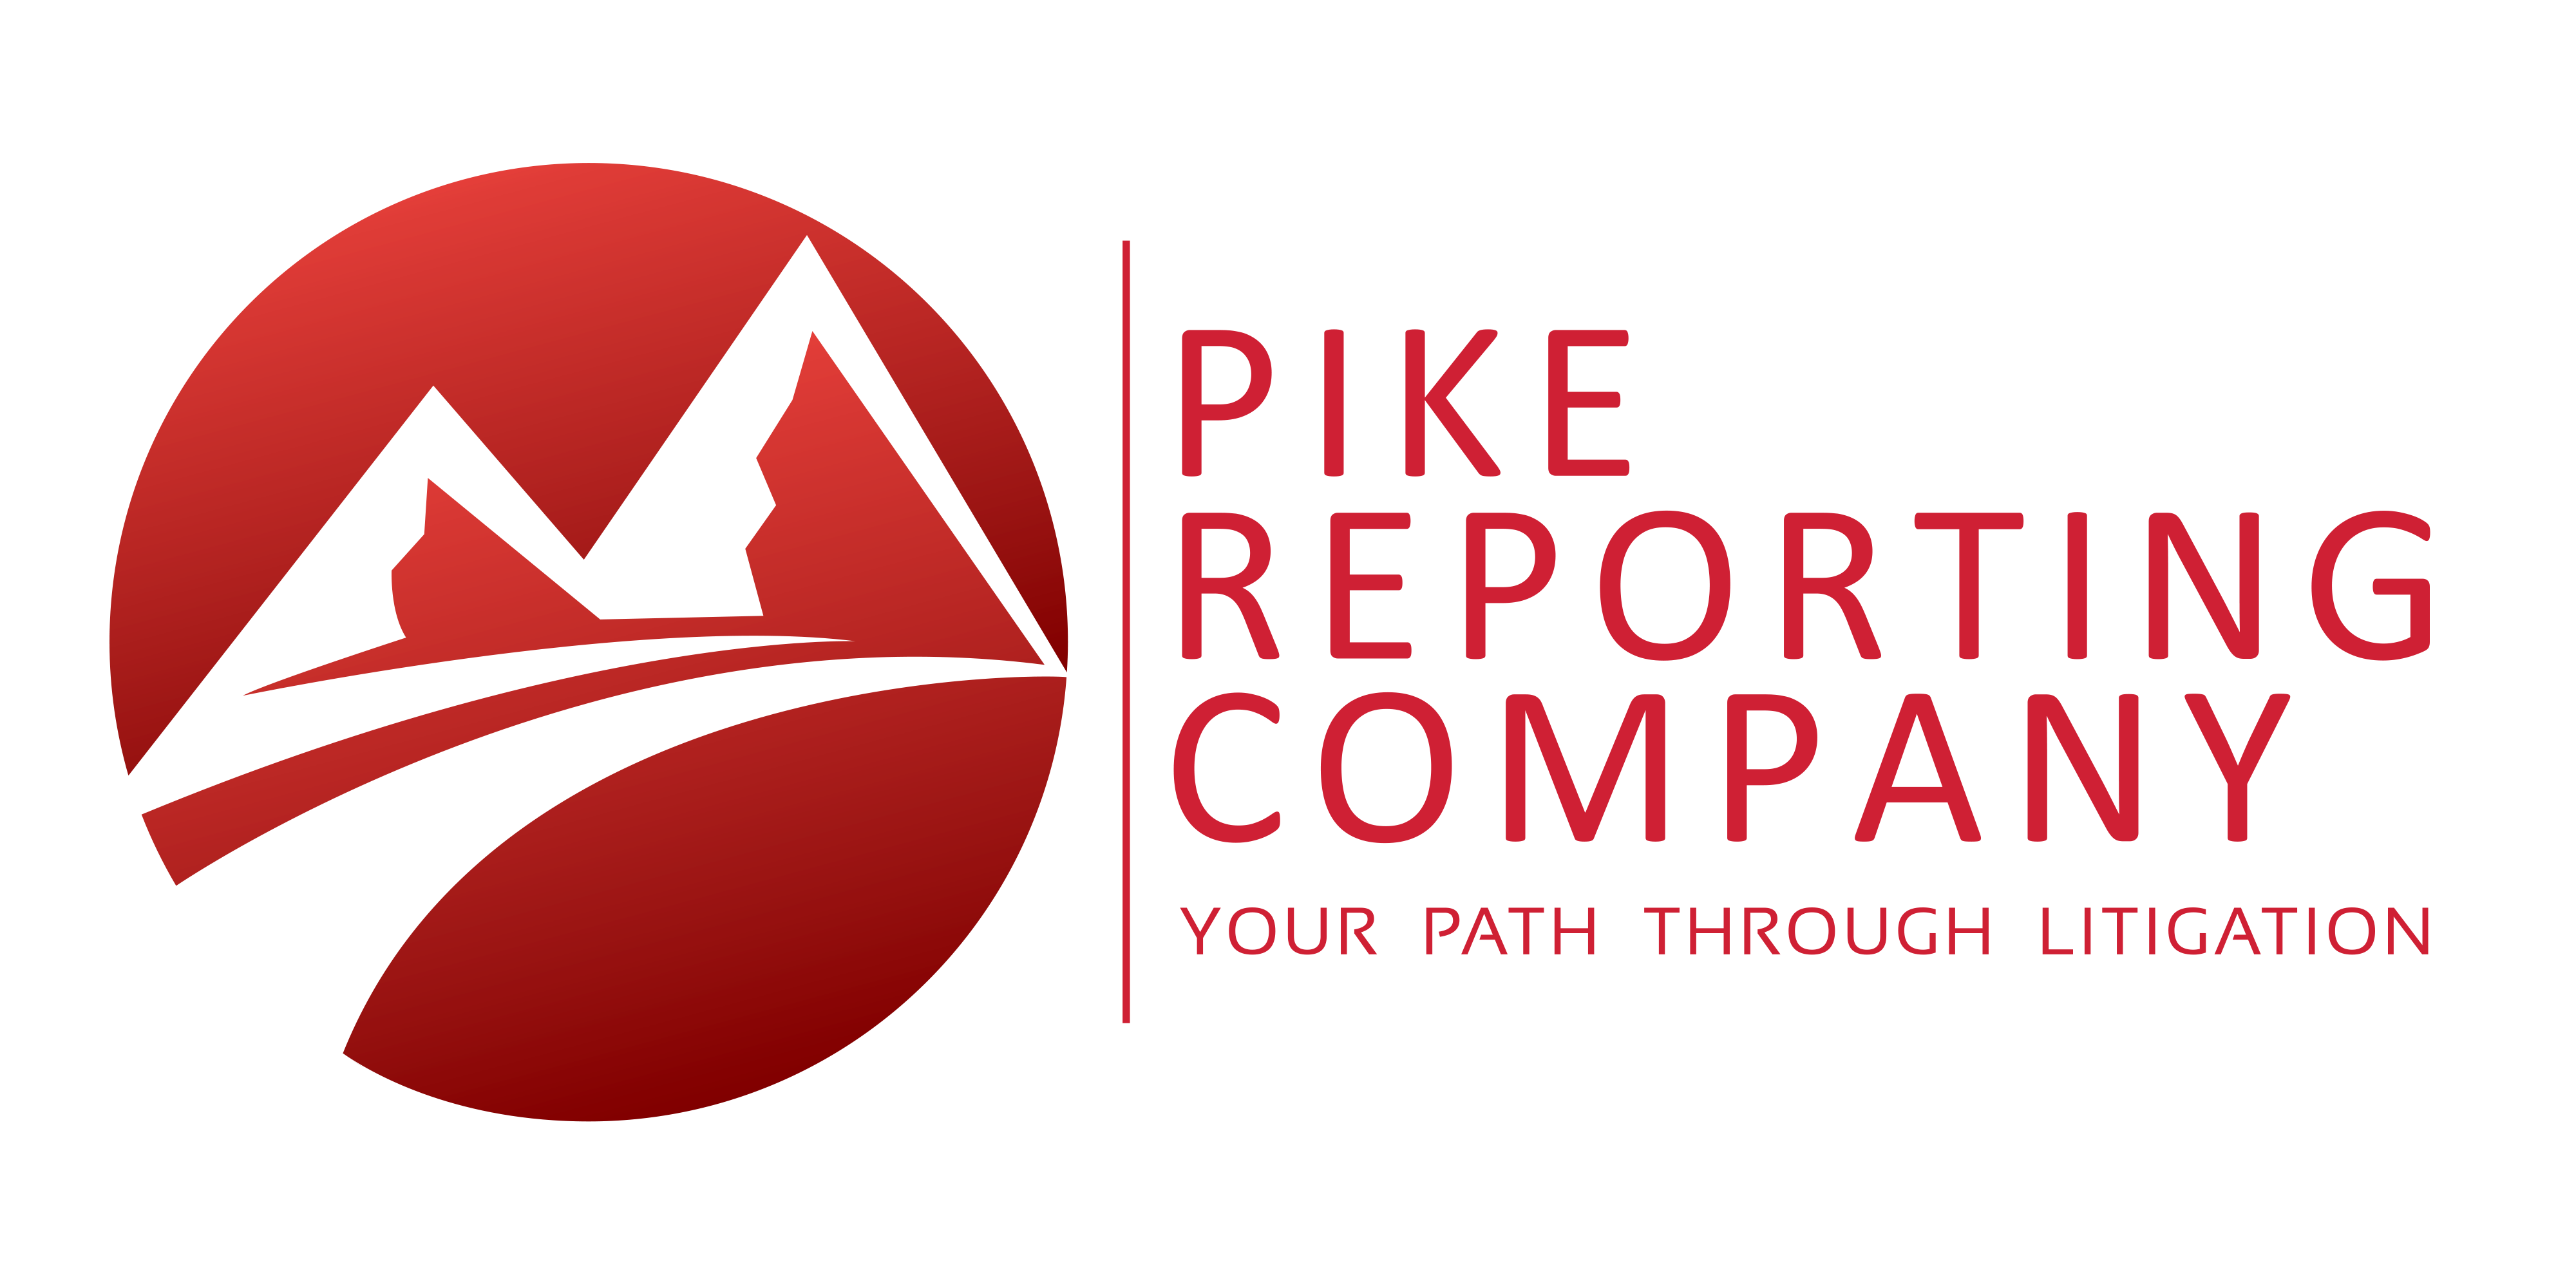 Pike Reporting Company logo